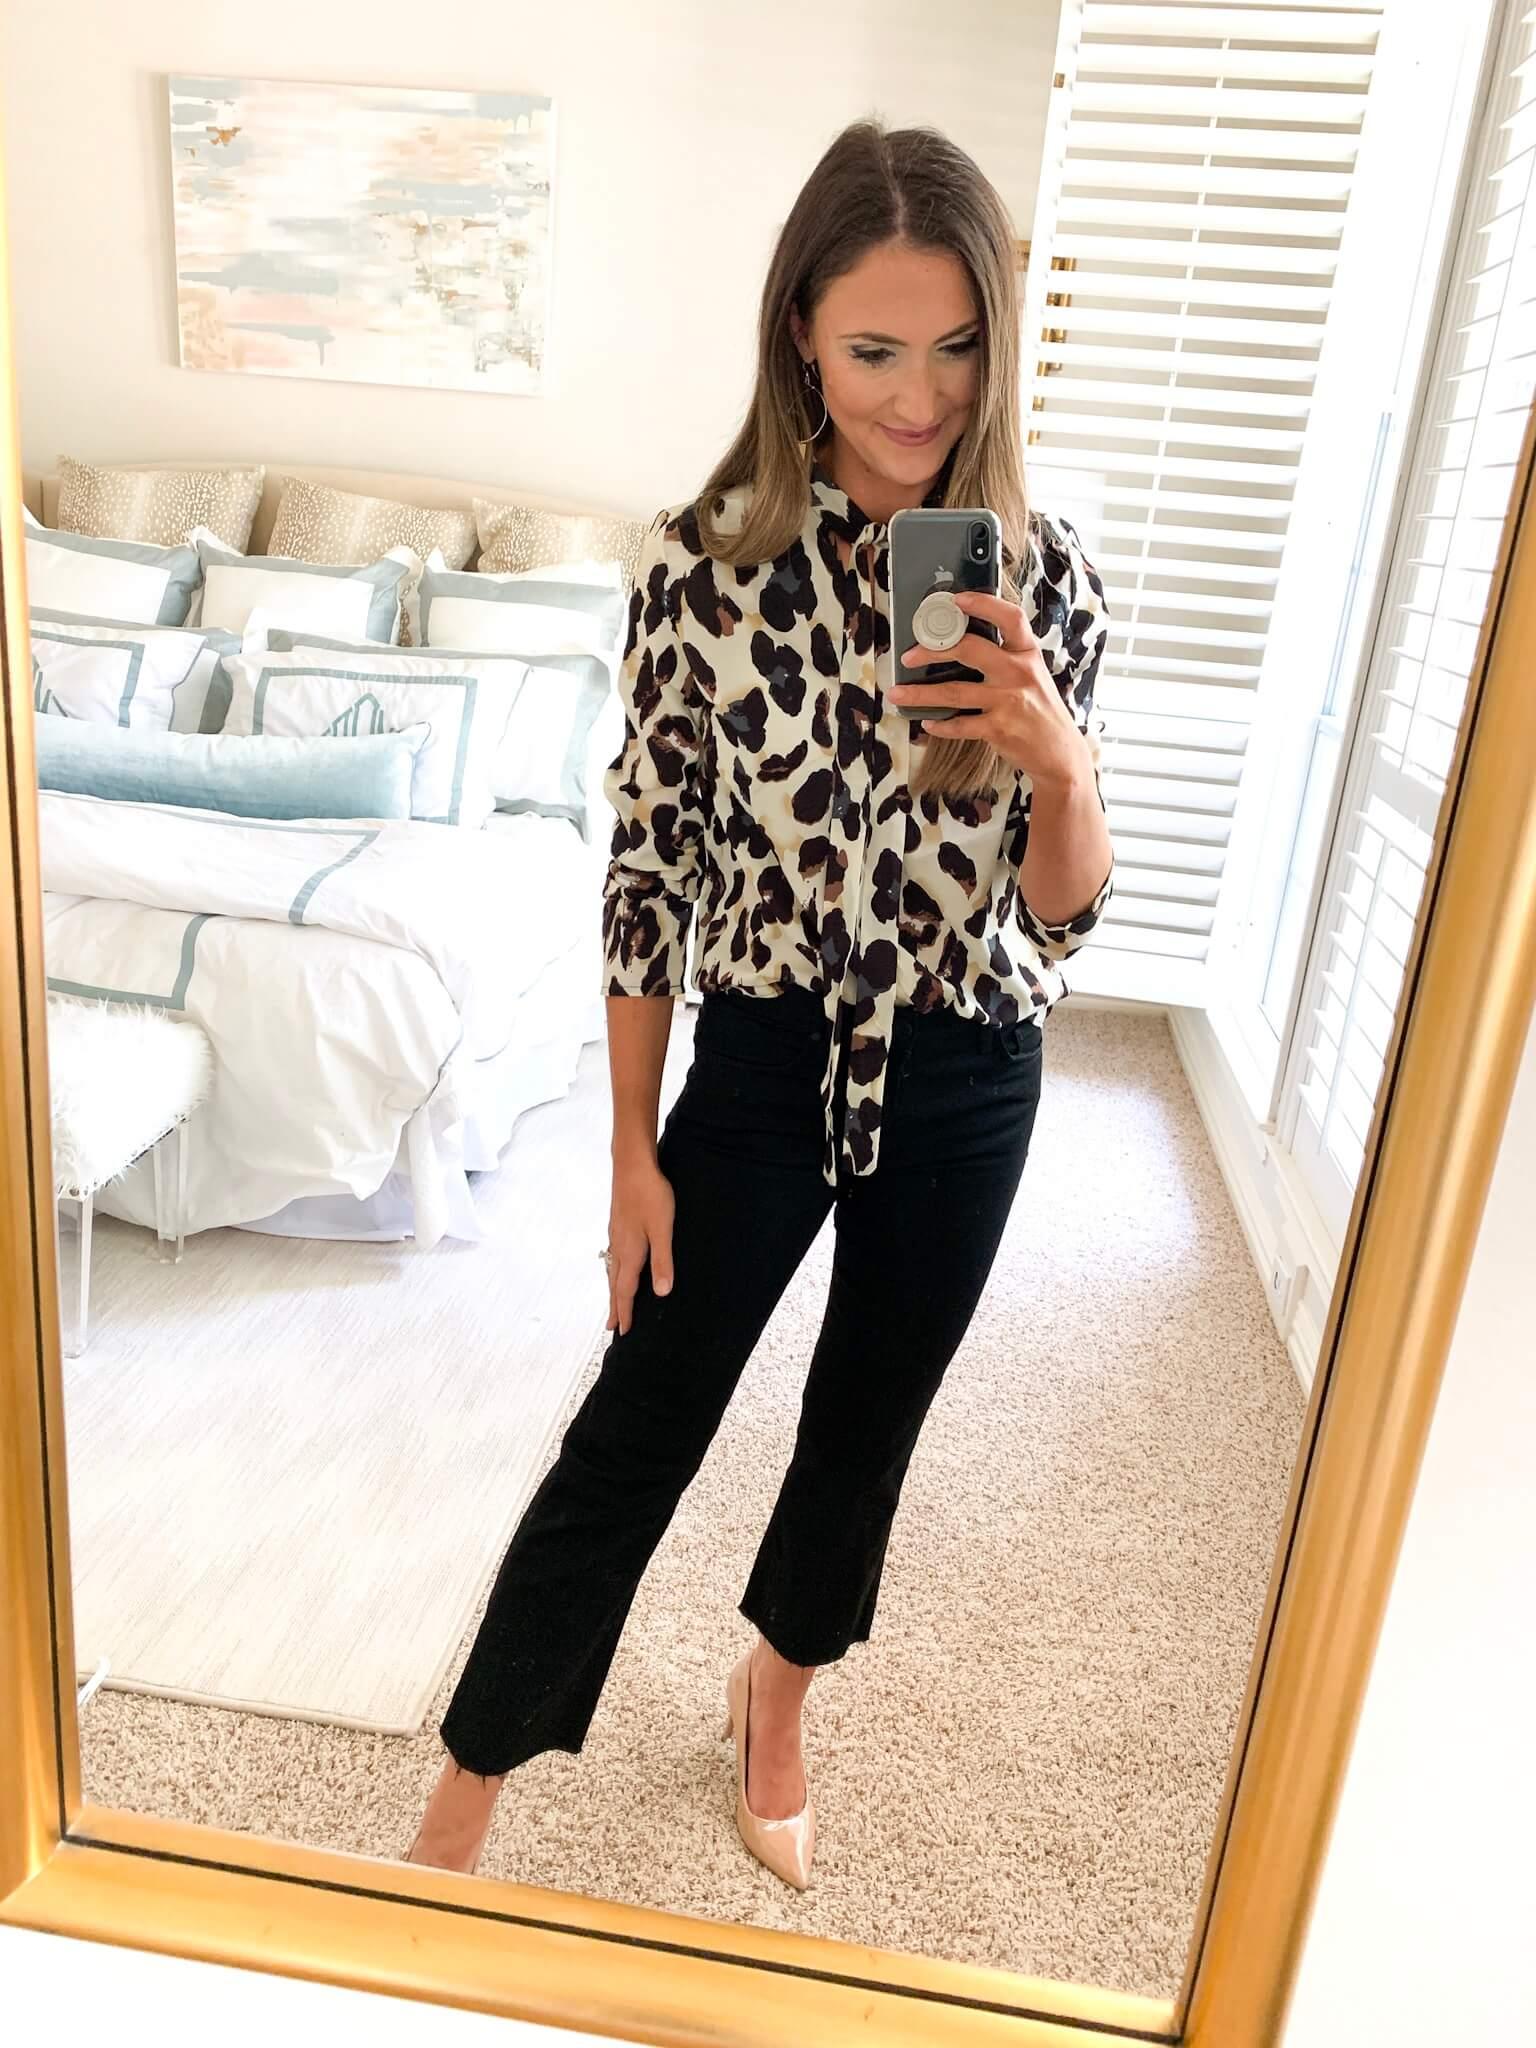 Amazon Fashion Haul | Style Your Senses | Amazon Prime haul | Leopard Top